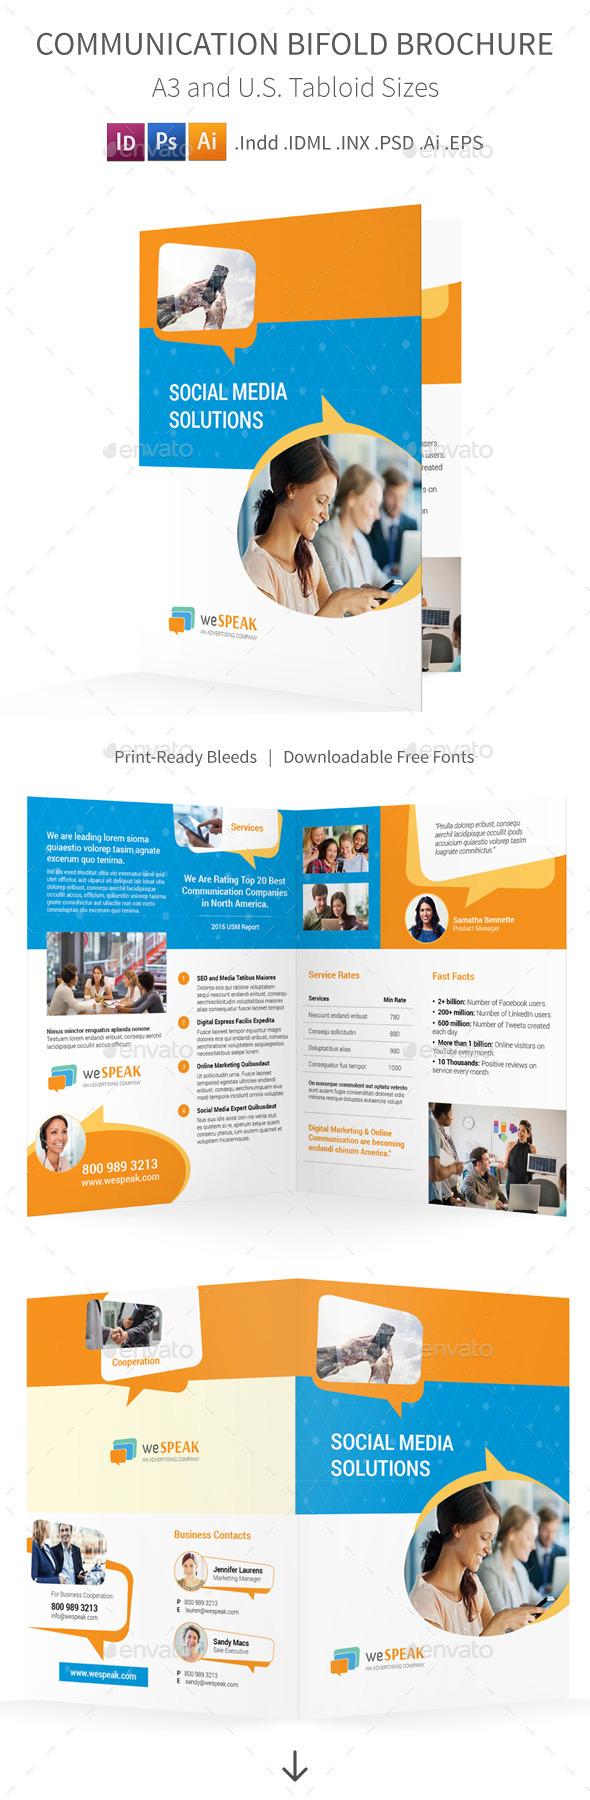 GraphicRiver Communication Bifold Halffold Brochure 11770413